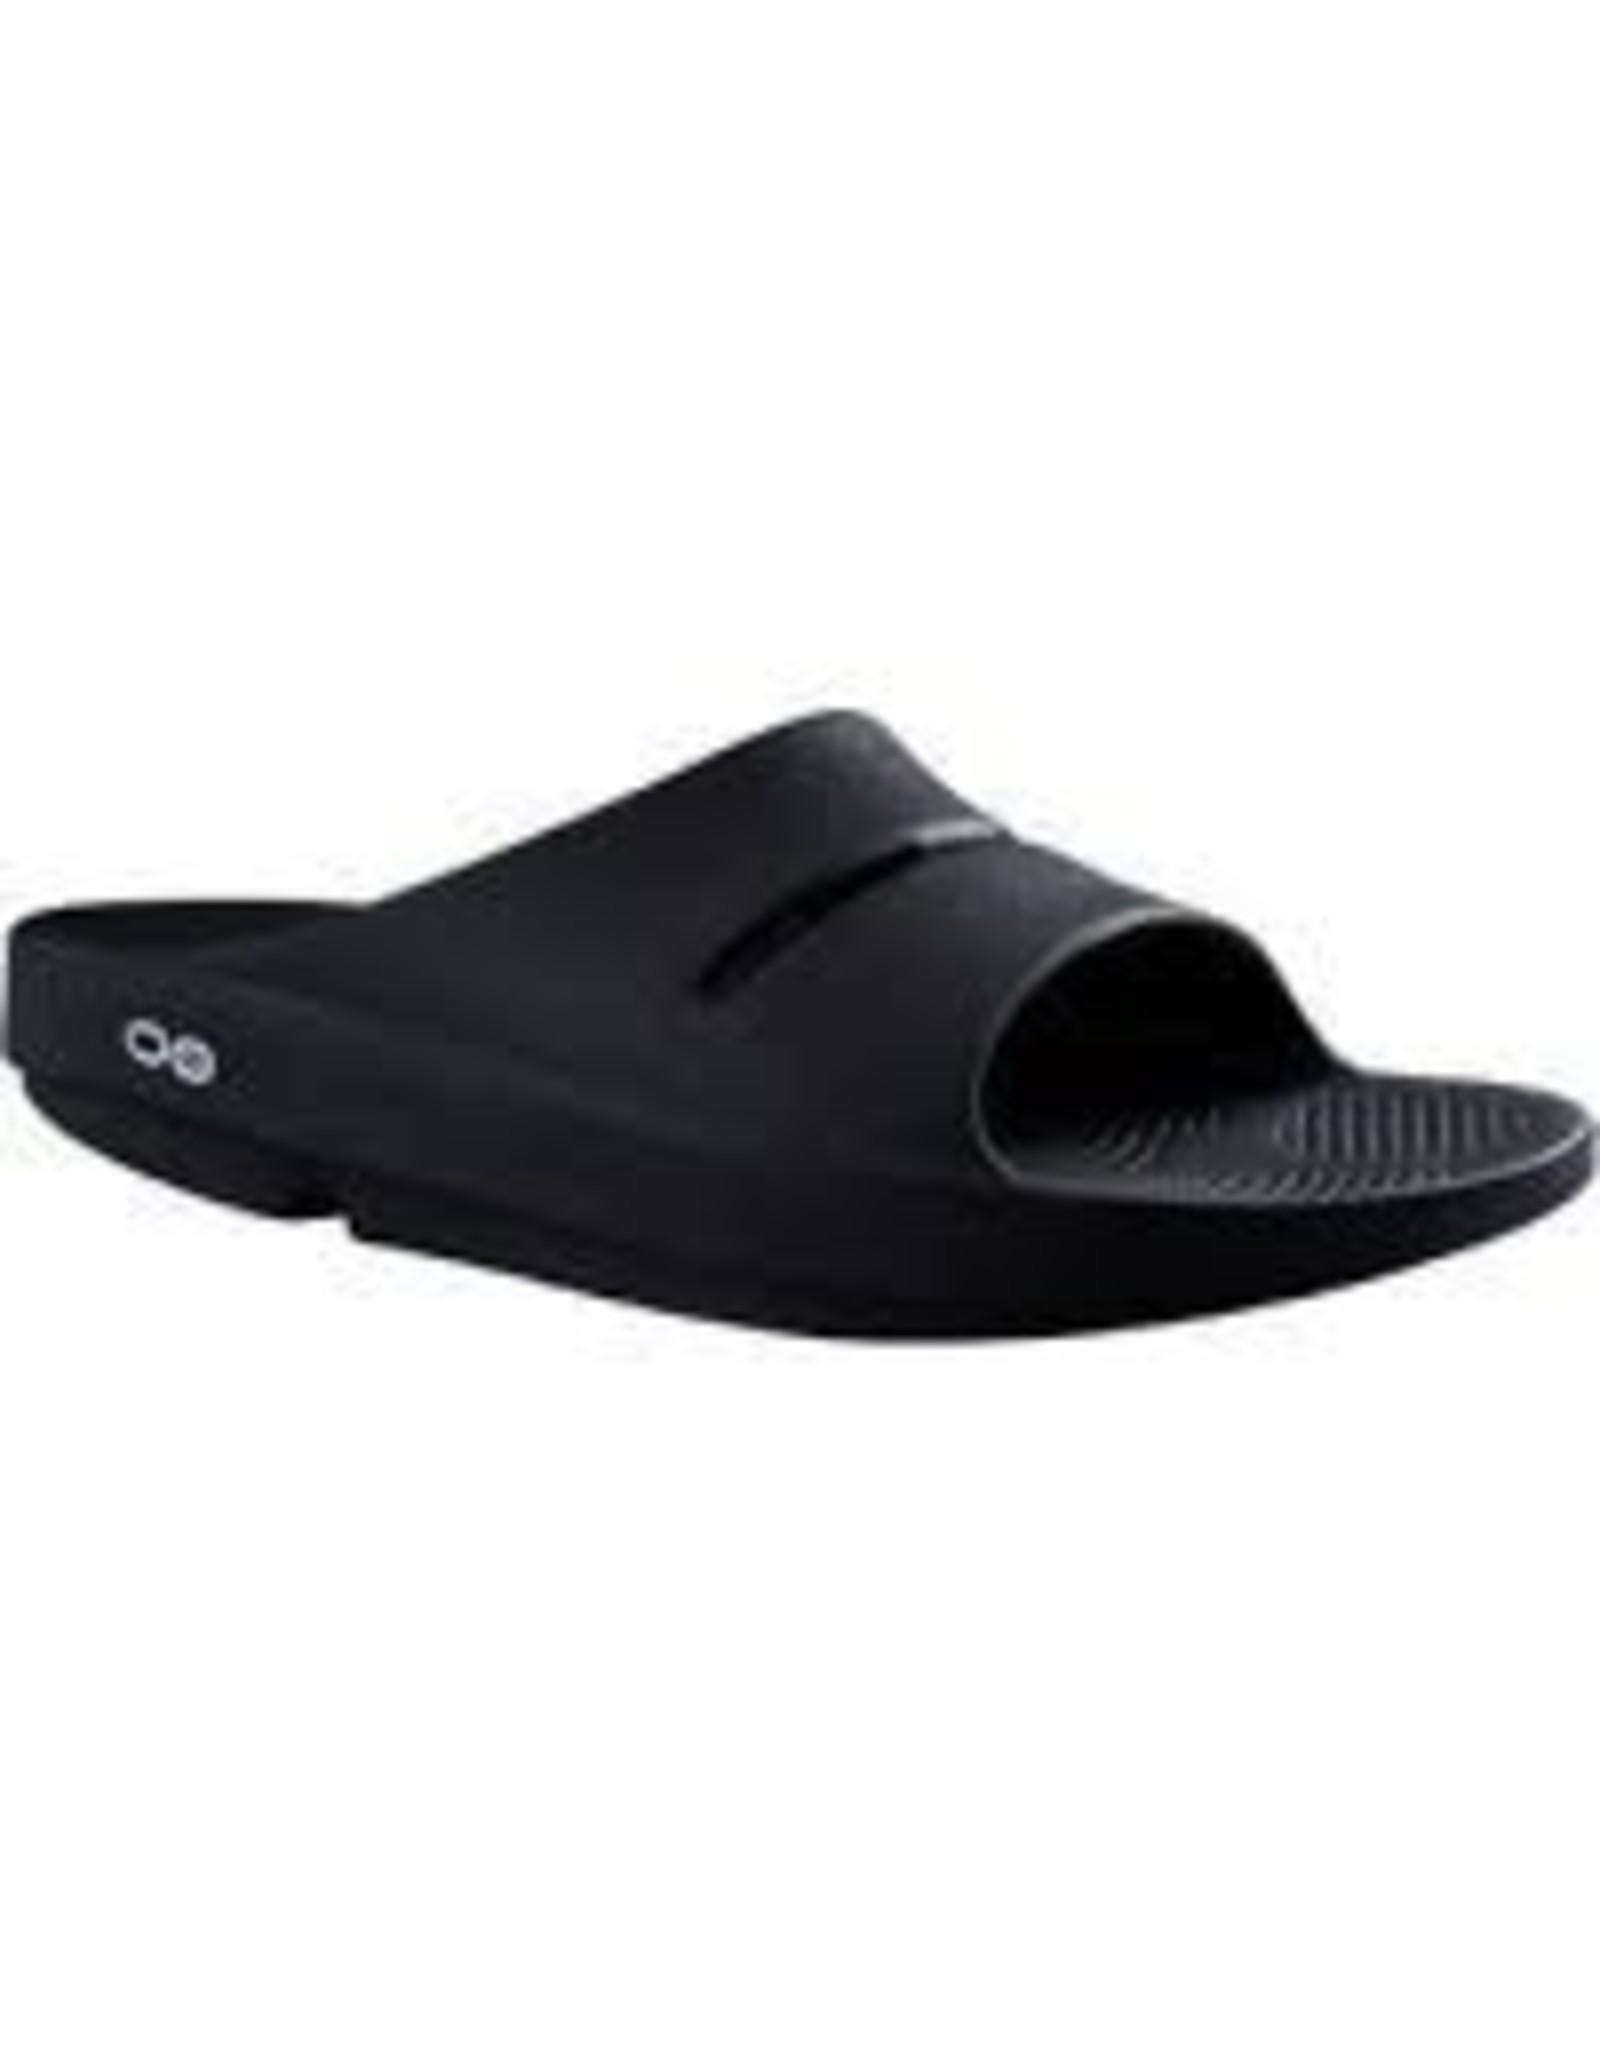 OOFOS Ooahh Slide Sandals